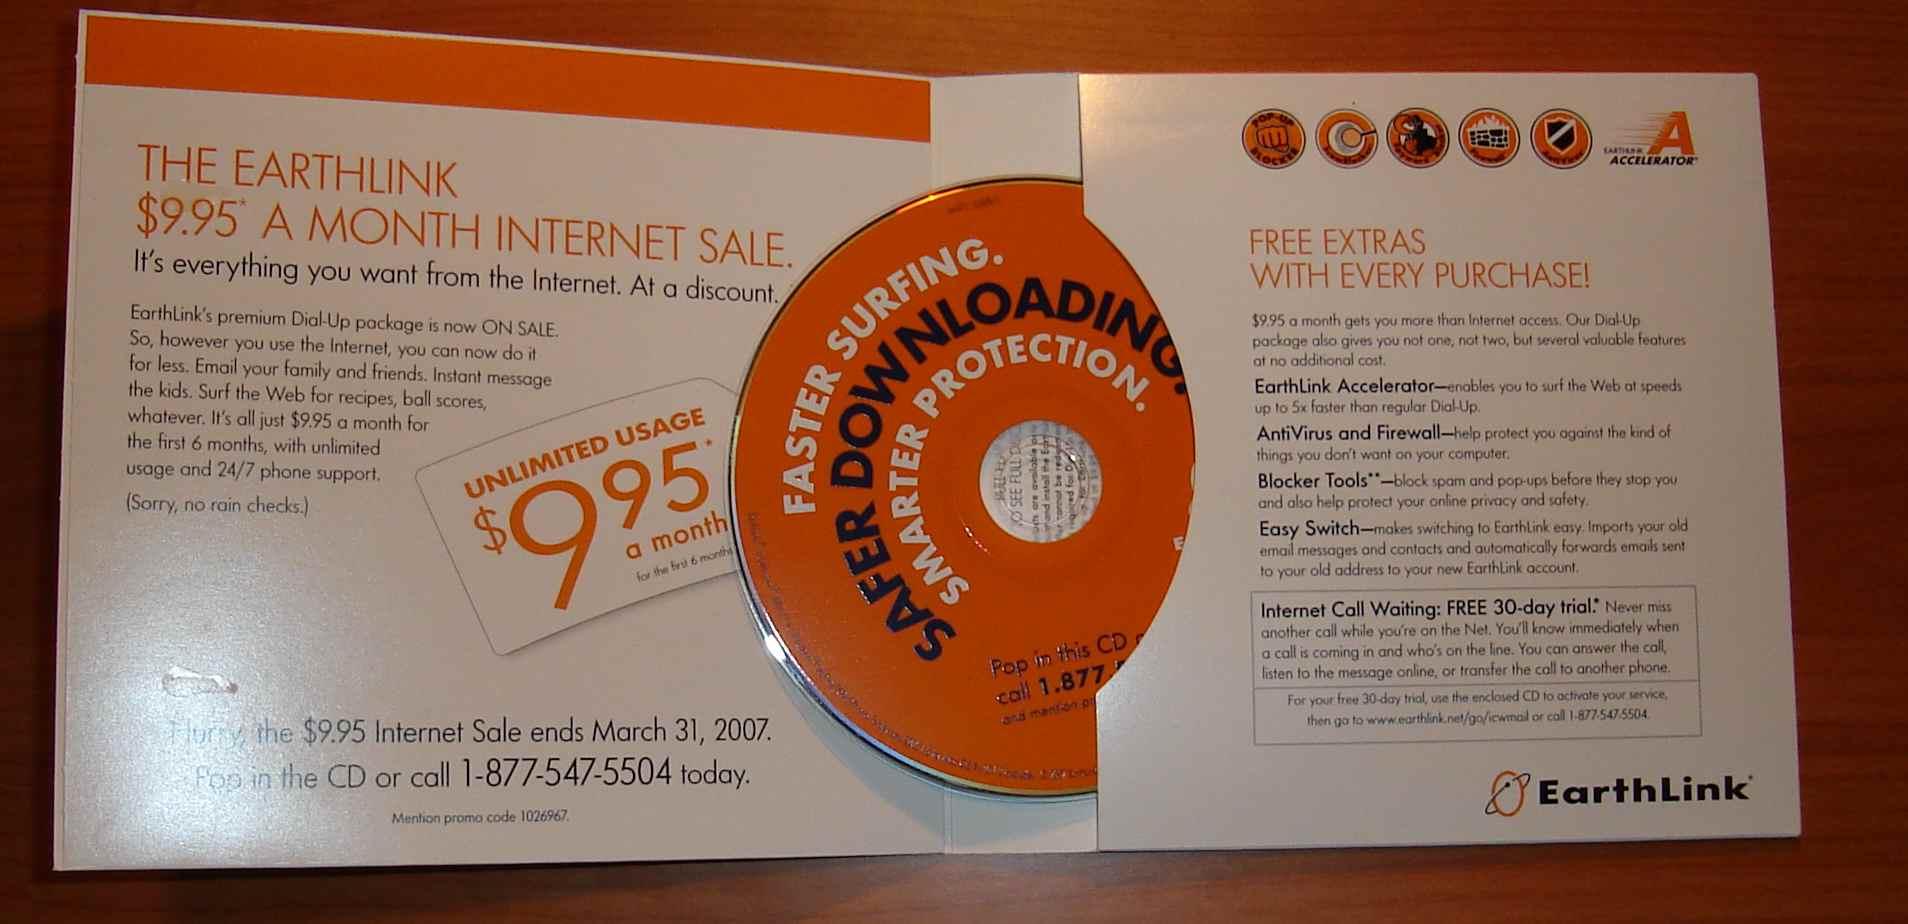 Earthlink still send out CDs